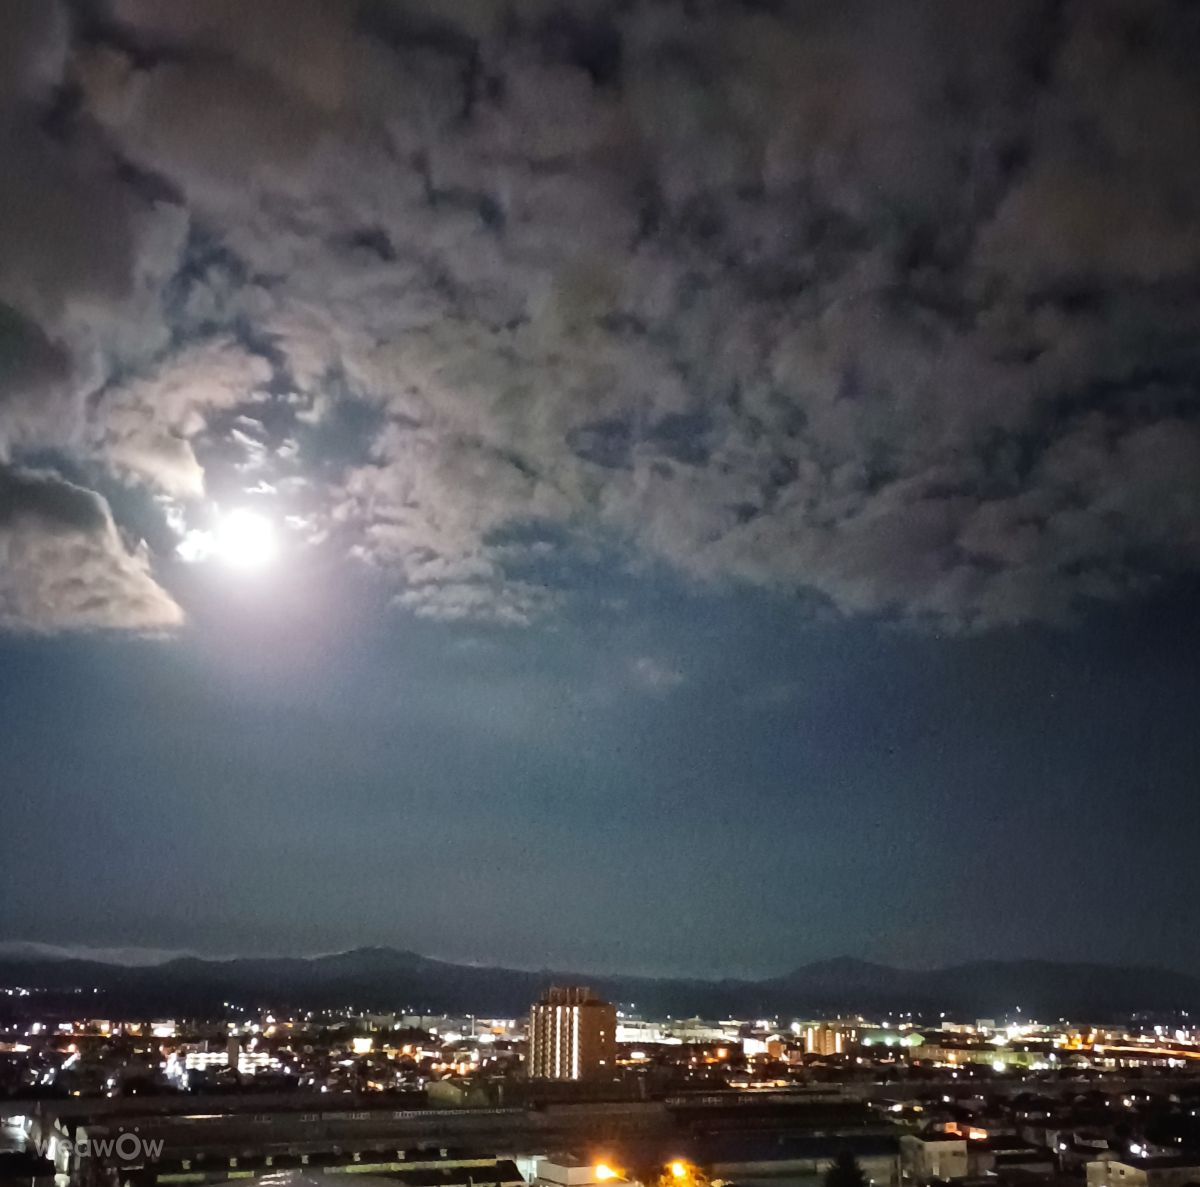 Fotógrafo ピンクスピネル, Fotos sobre el clima en Kōriyama - Weawow